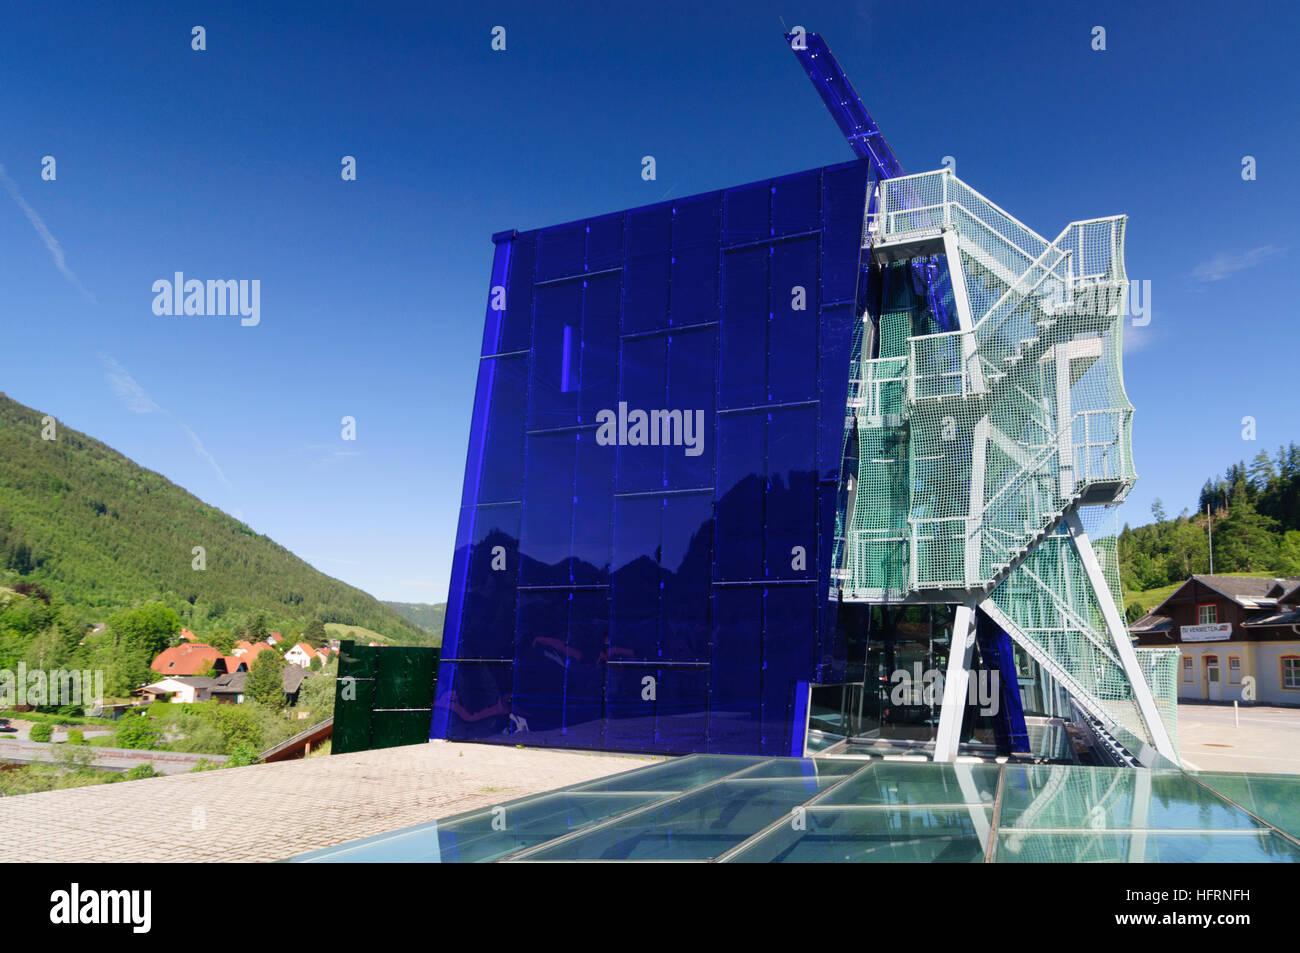 Murau: Building of the district management office, Murtal, Steiermark, Styria, Austria - Stock Image